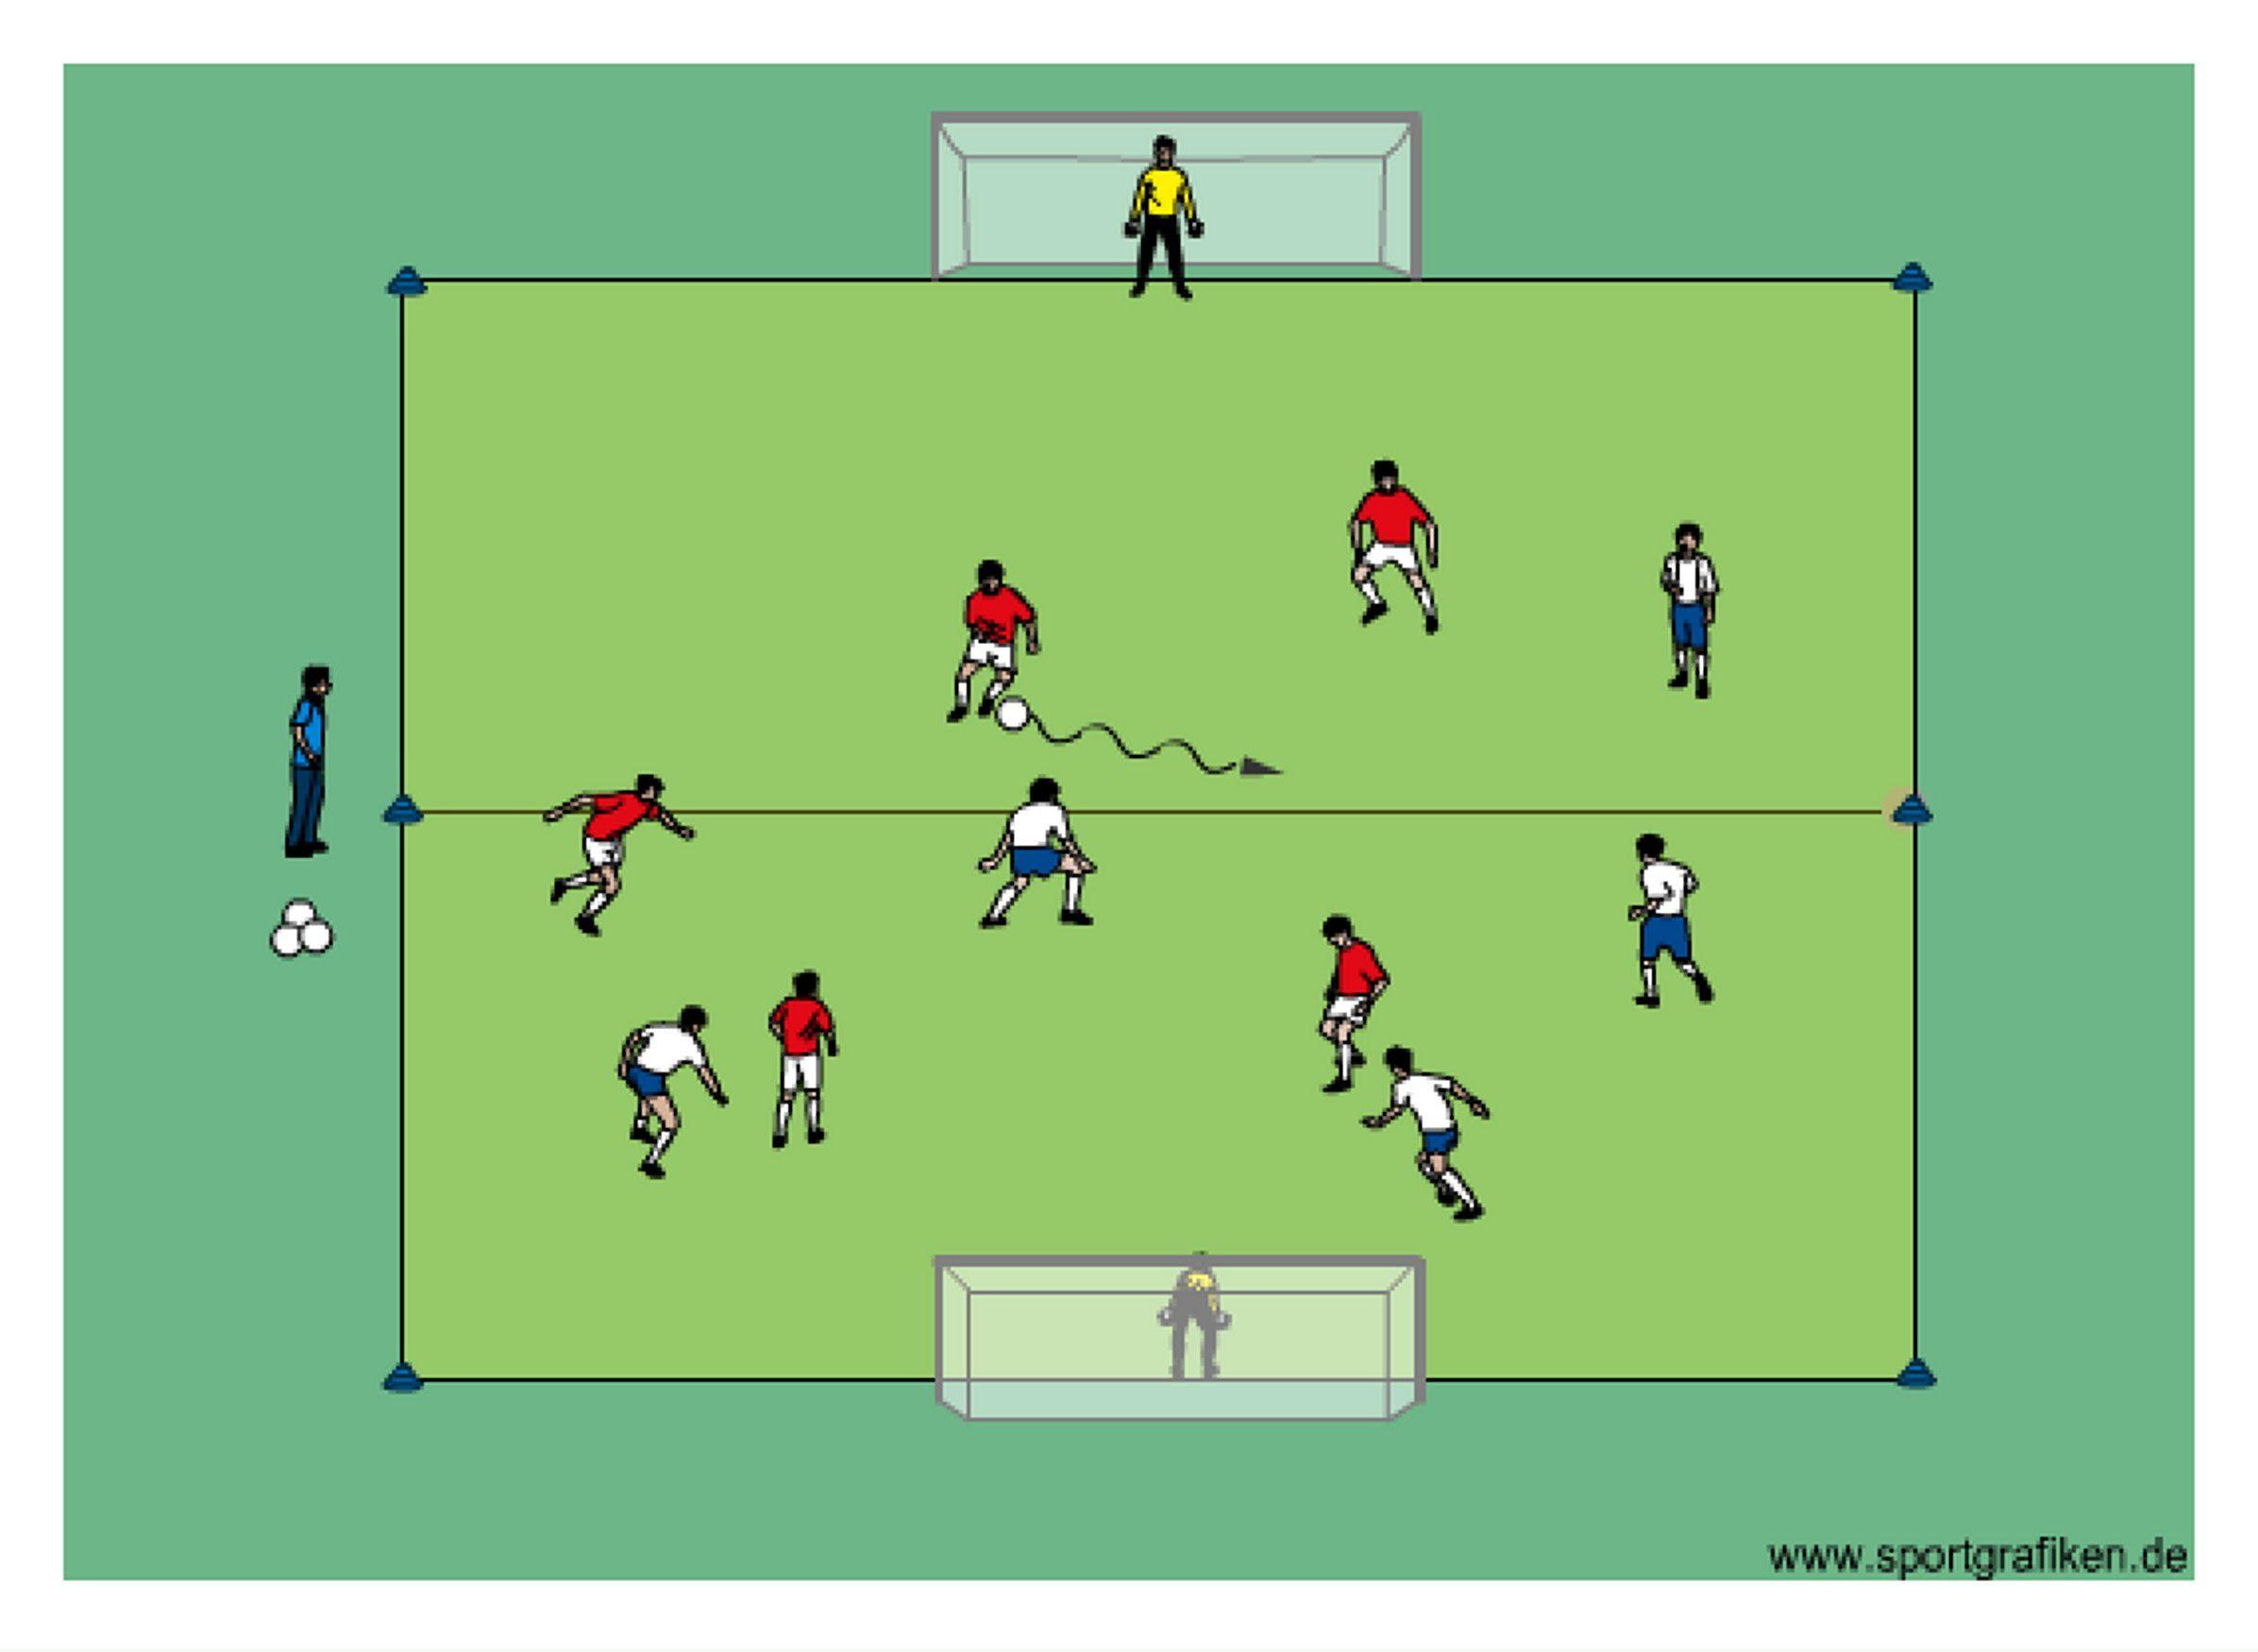 Soccer 5v5 King Player Training Drill Soccer training